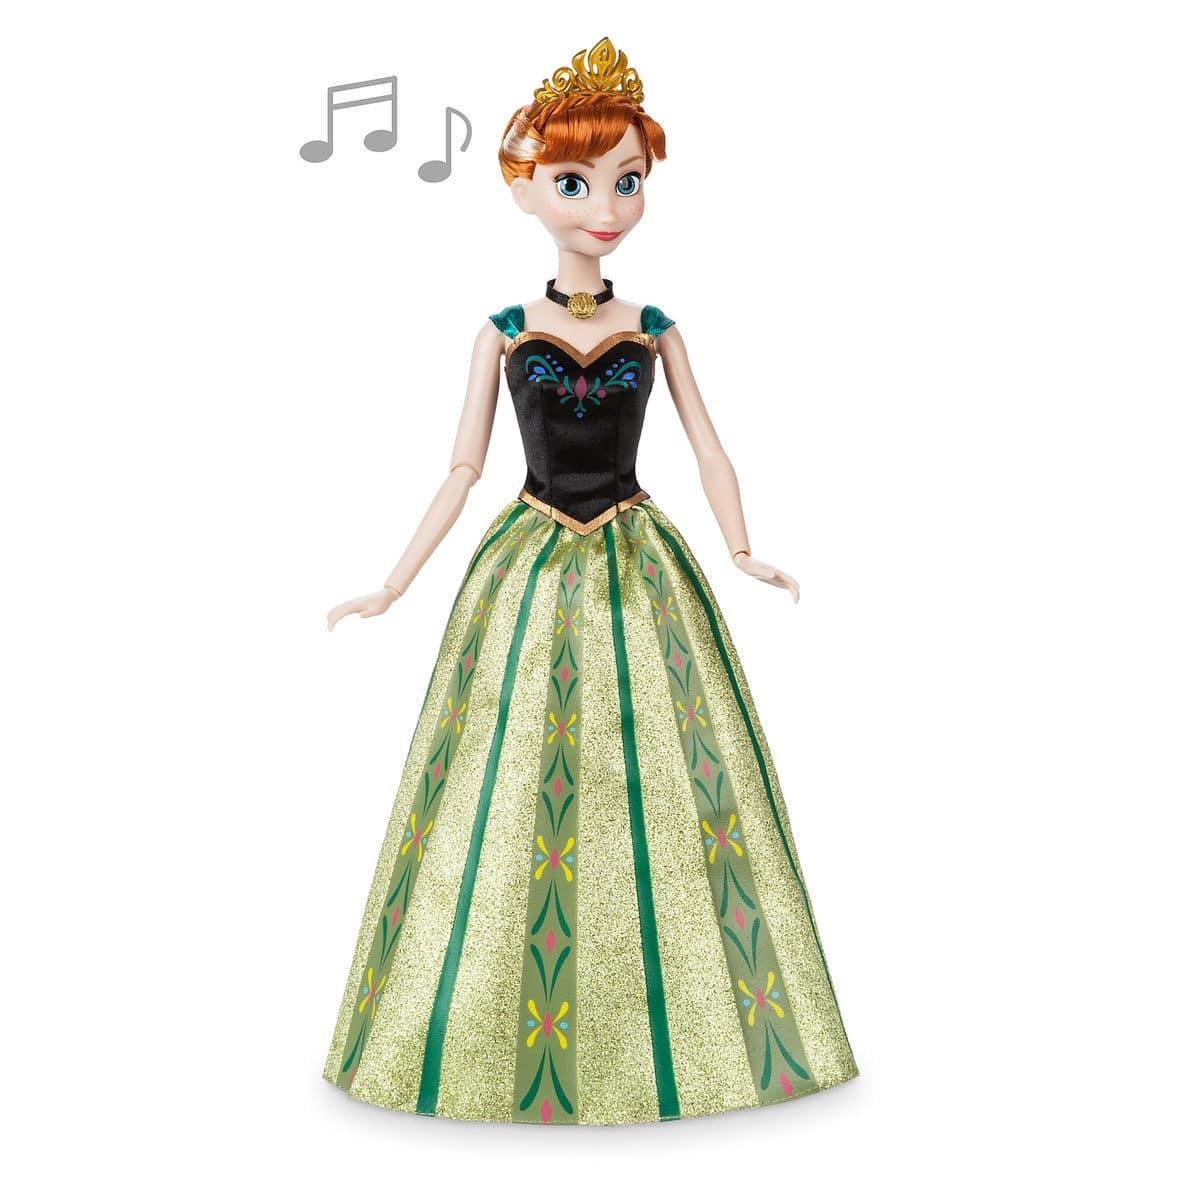 Кукла Disney Анна поющая, Фрозен 0706P